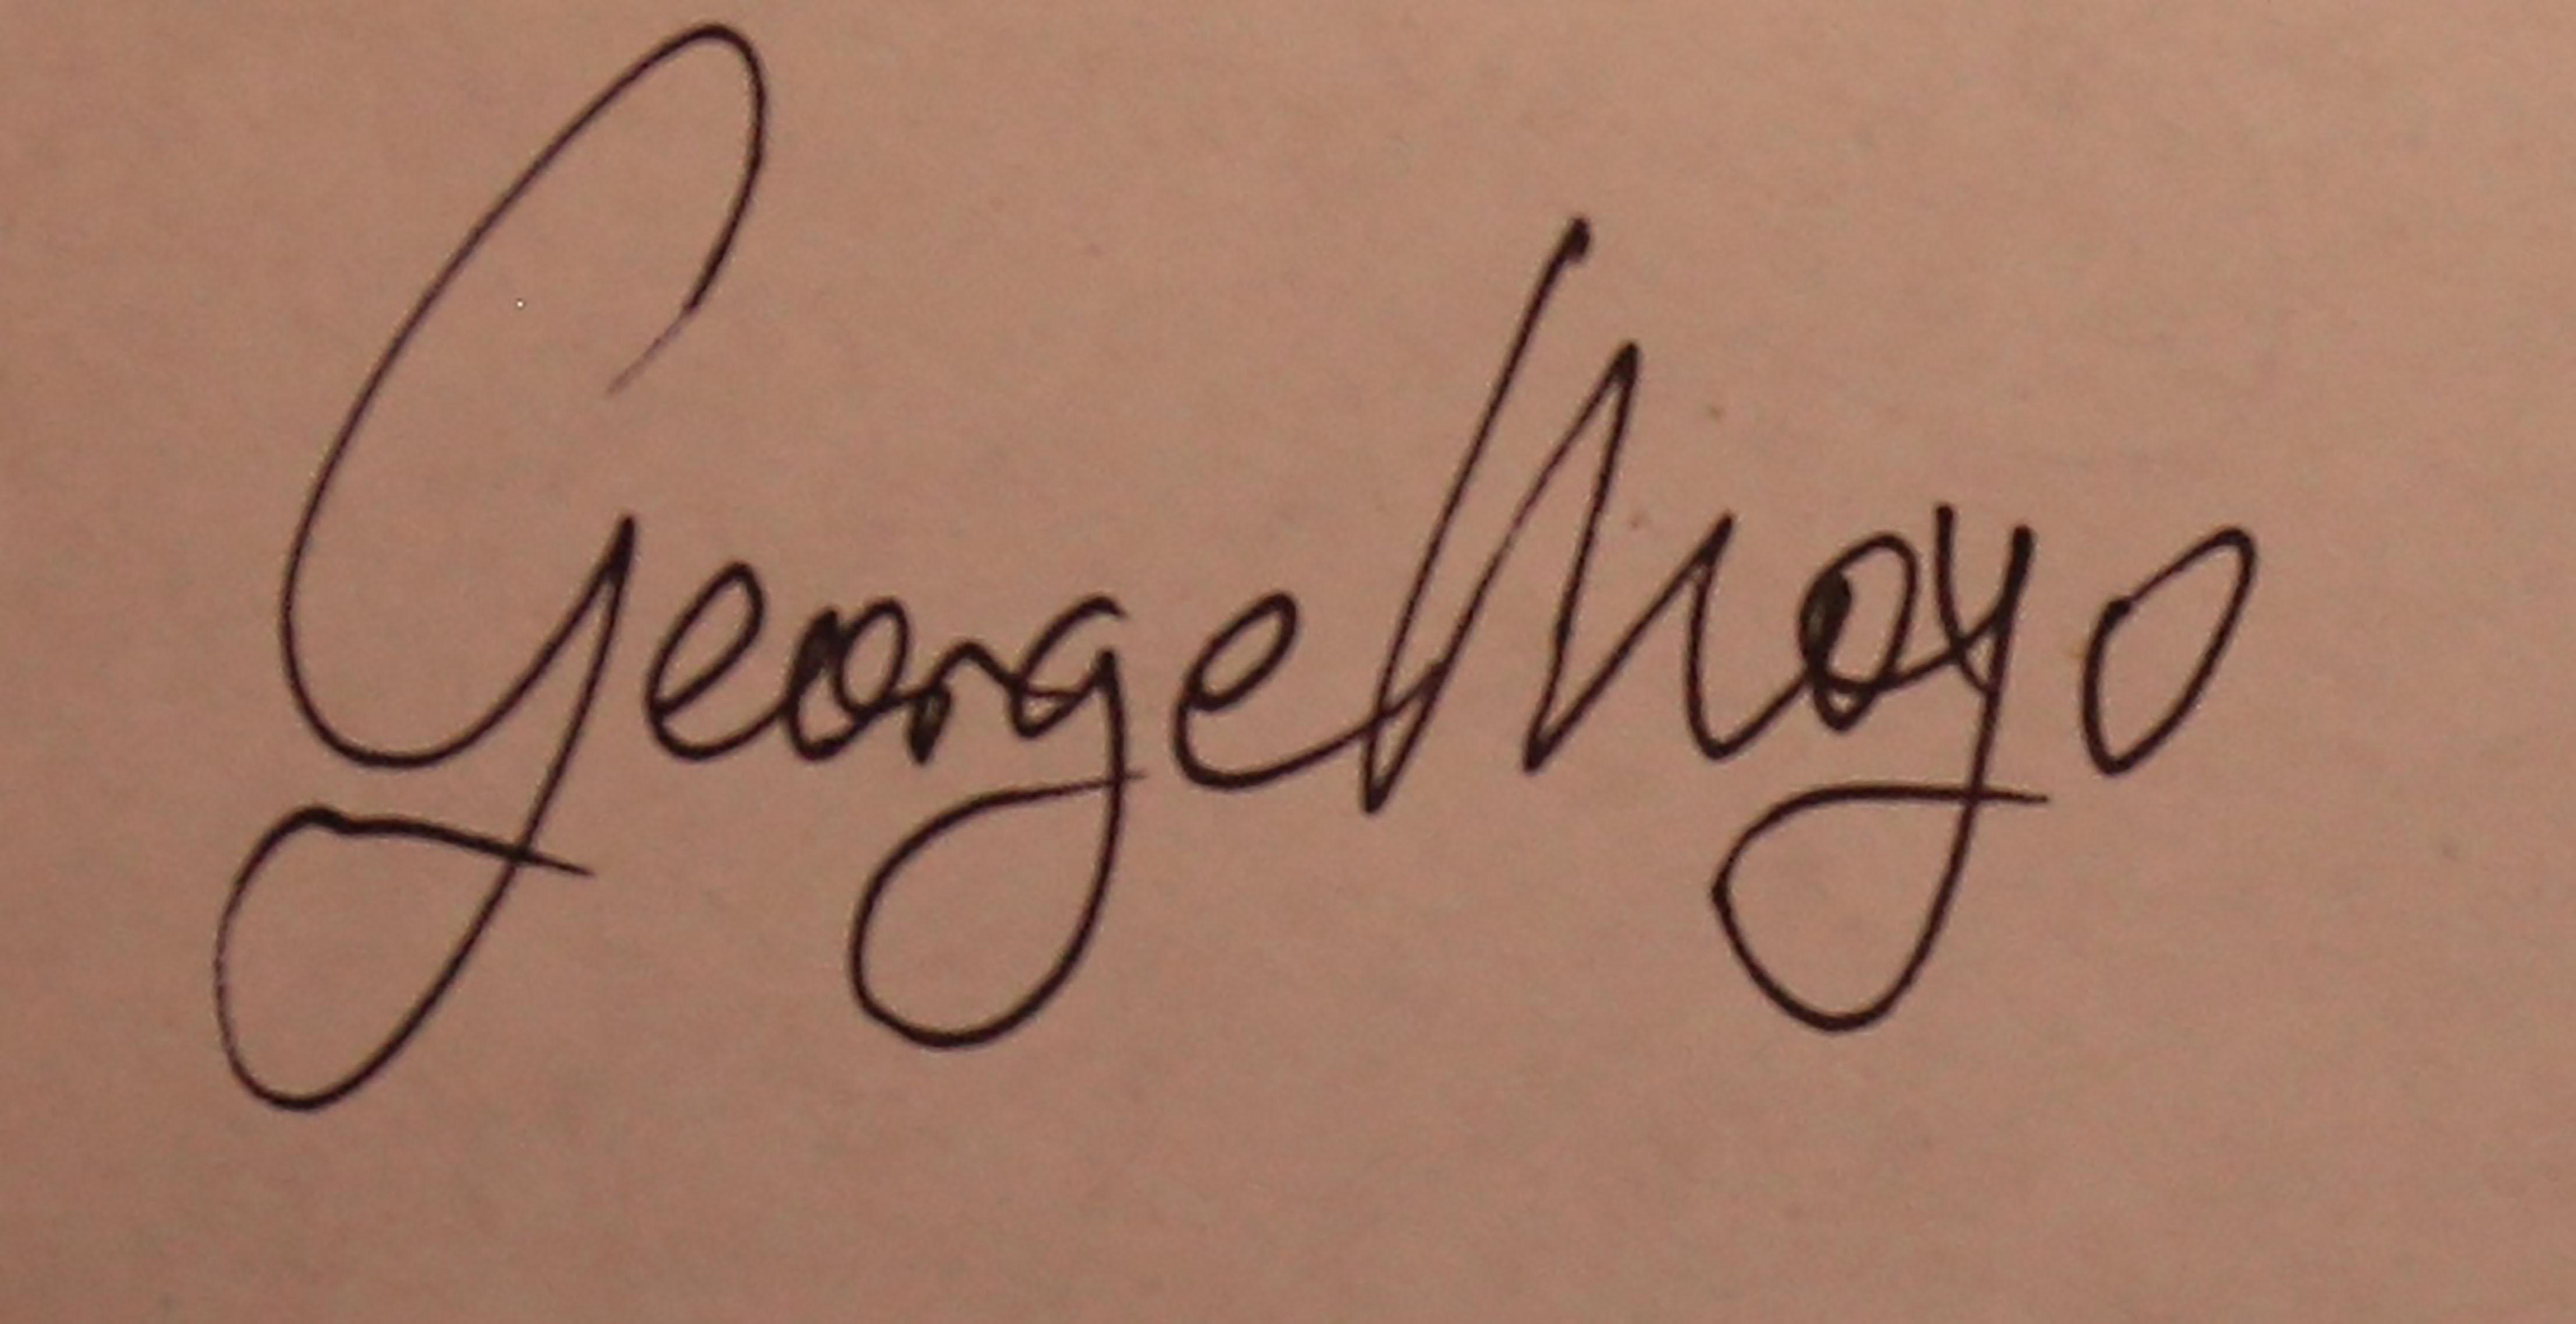 George Moyo Signature